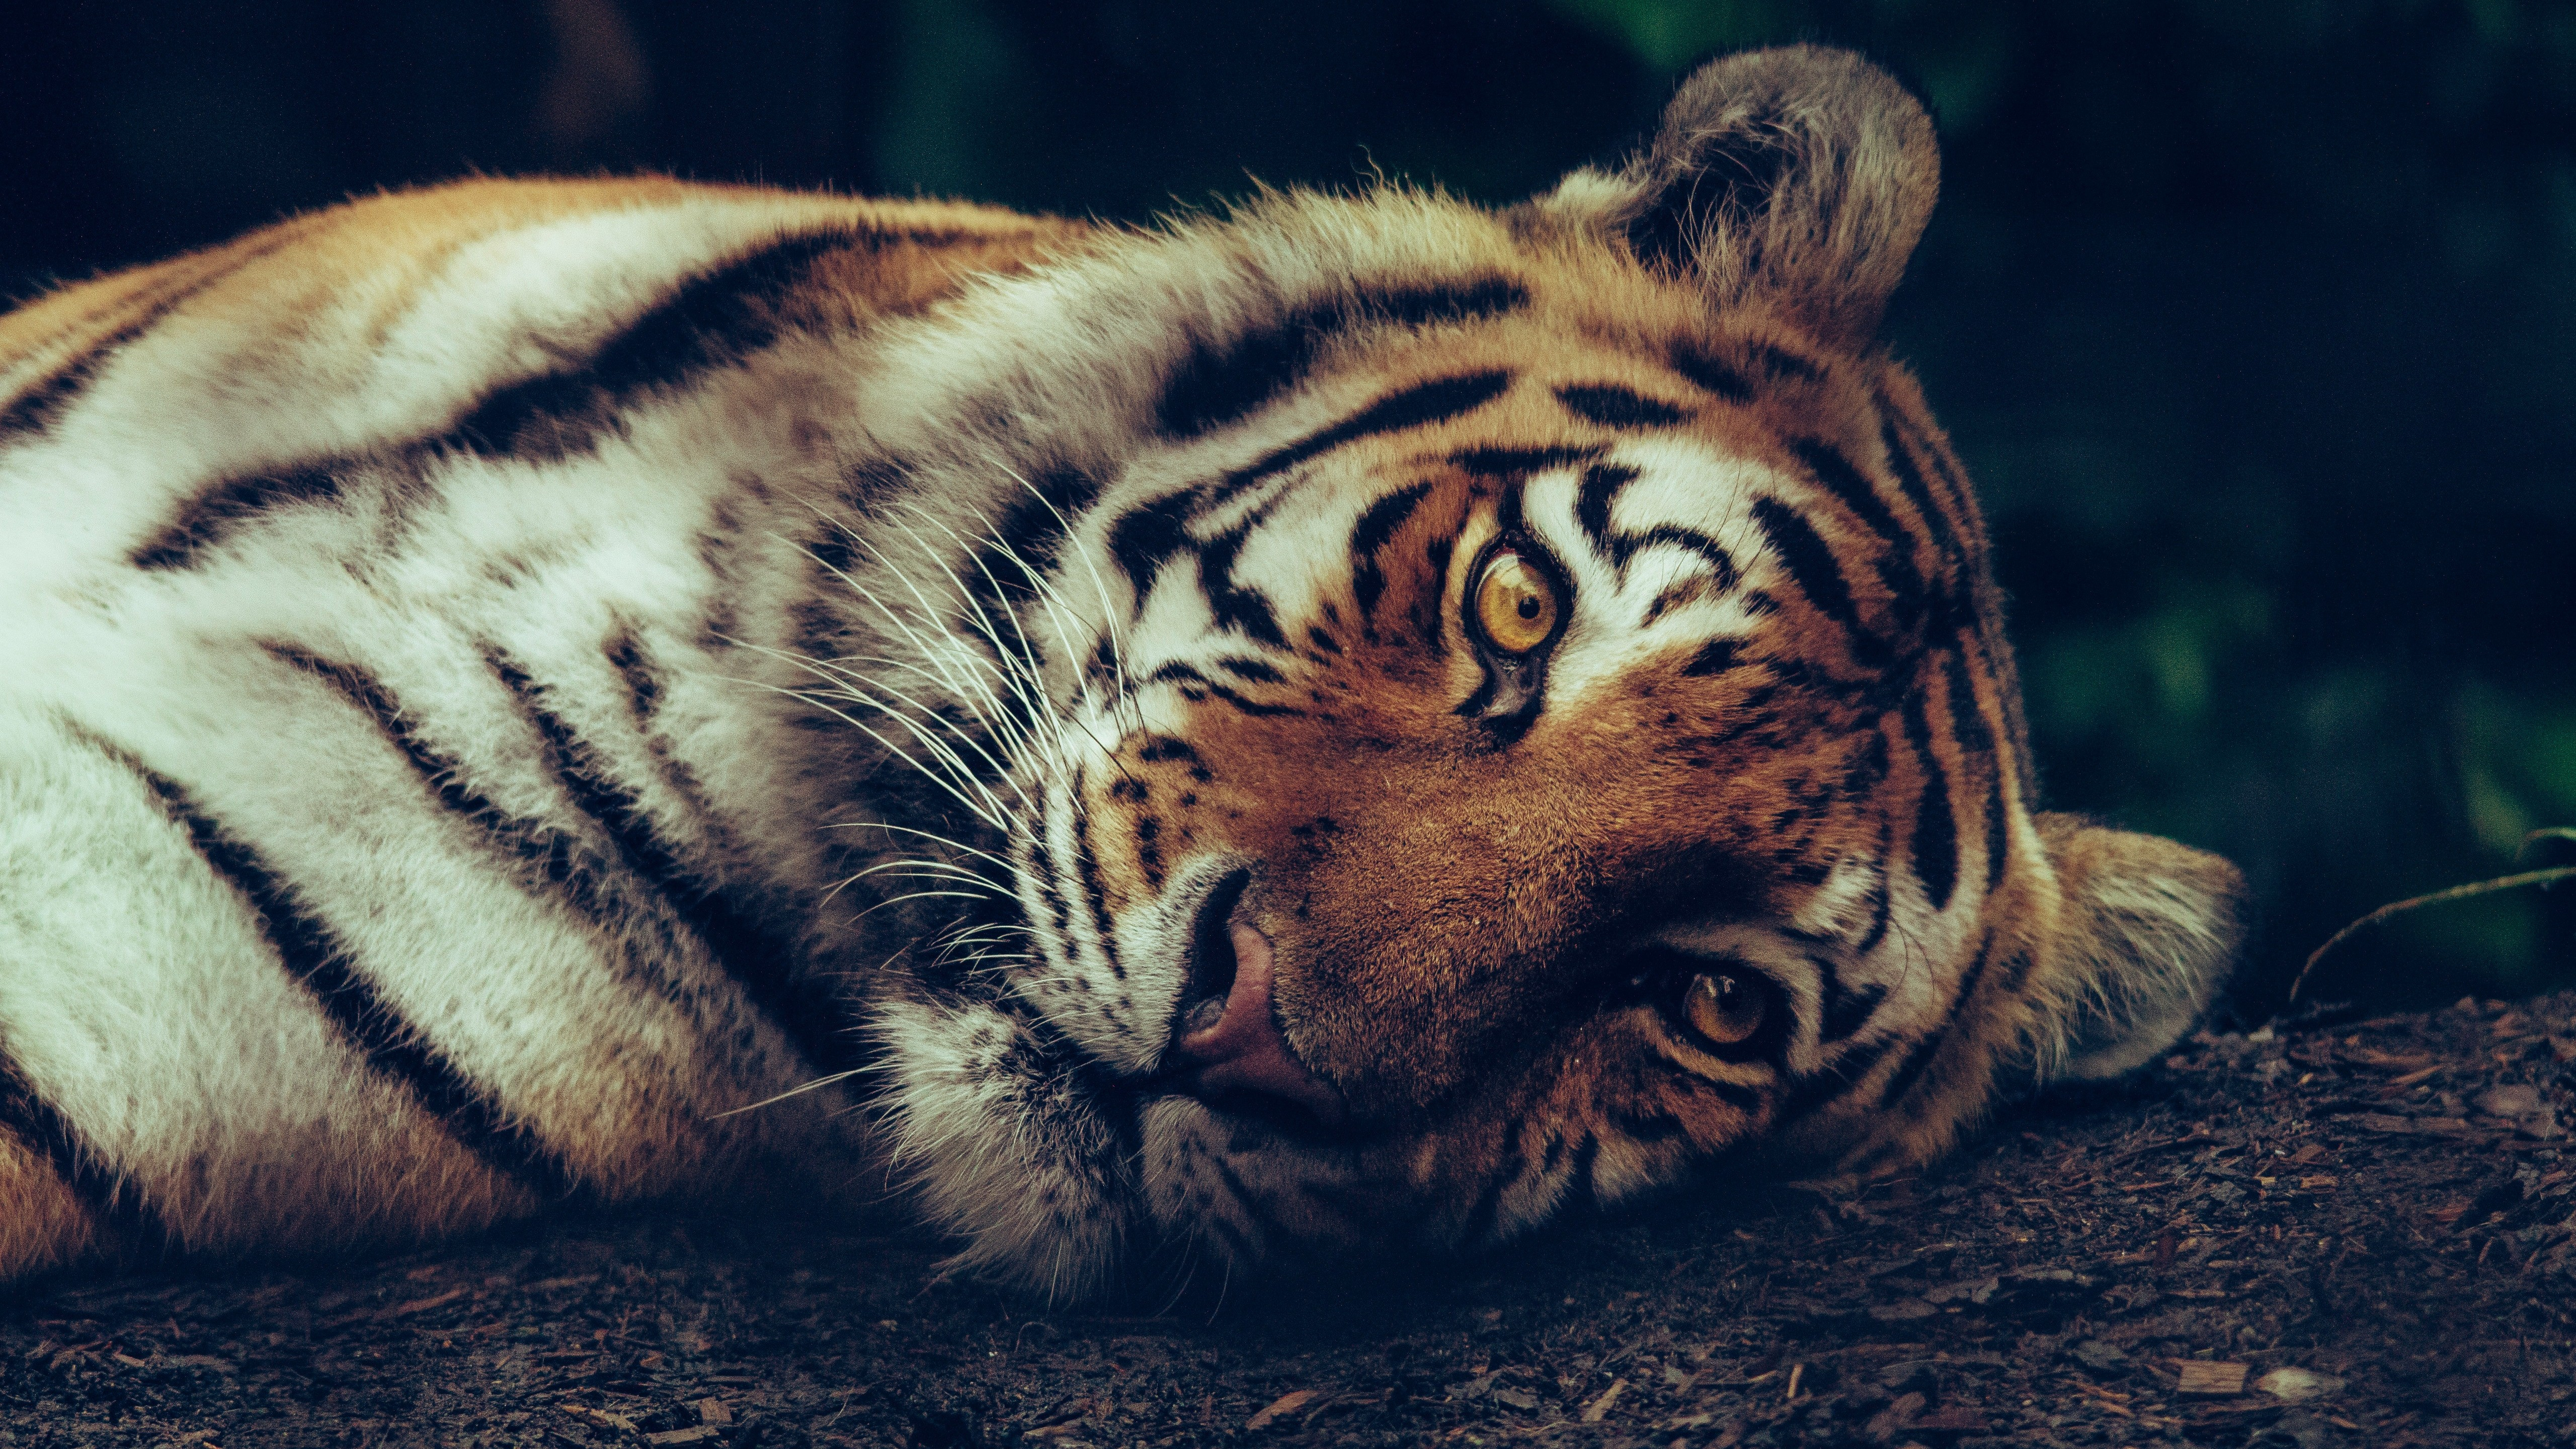 Tiger Sleeping 5K Wallpaper HD Wallpapers 5120x2880